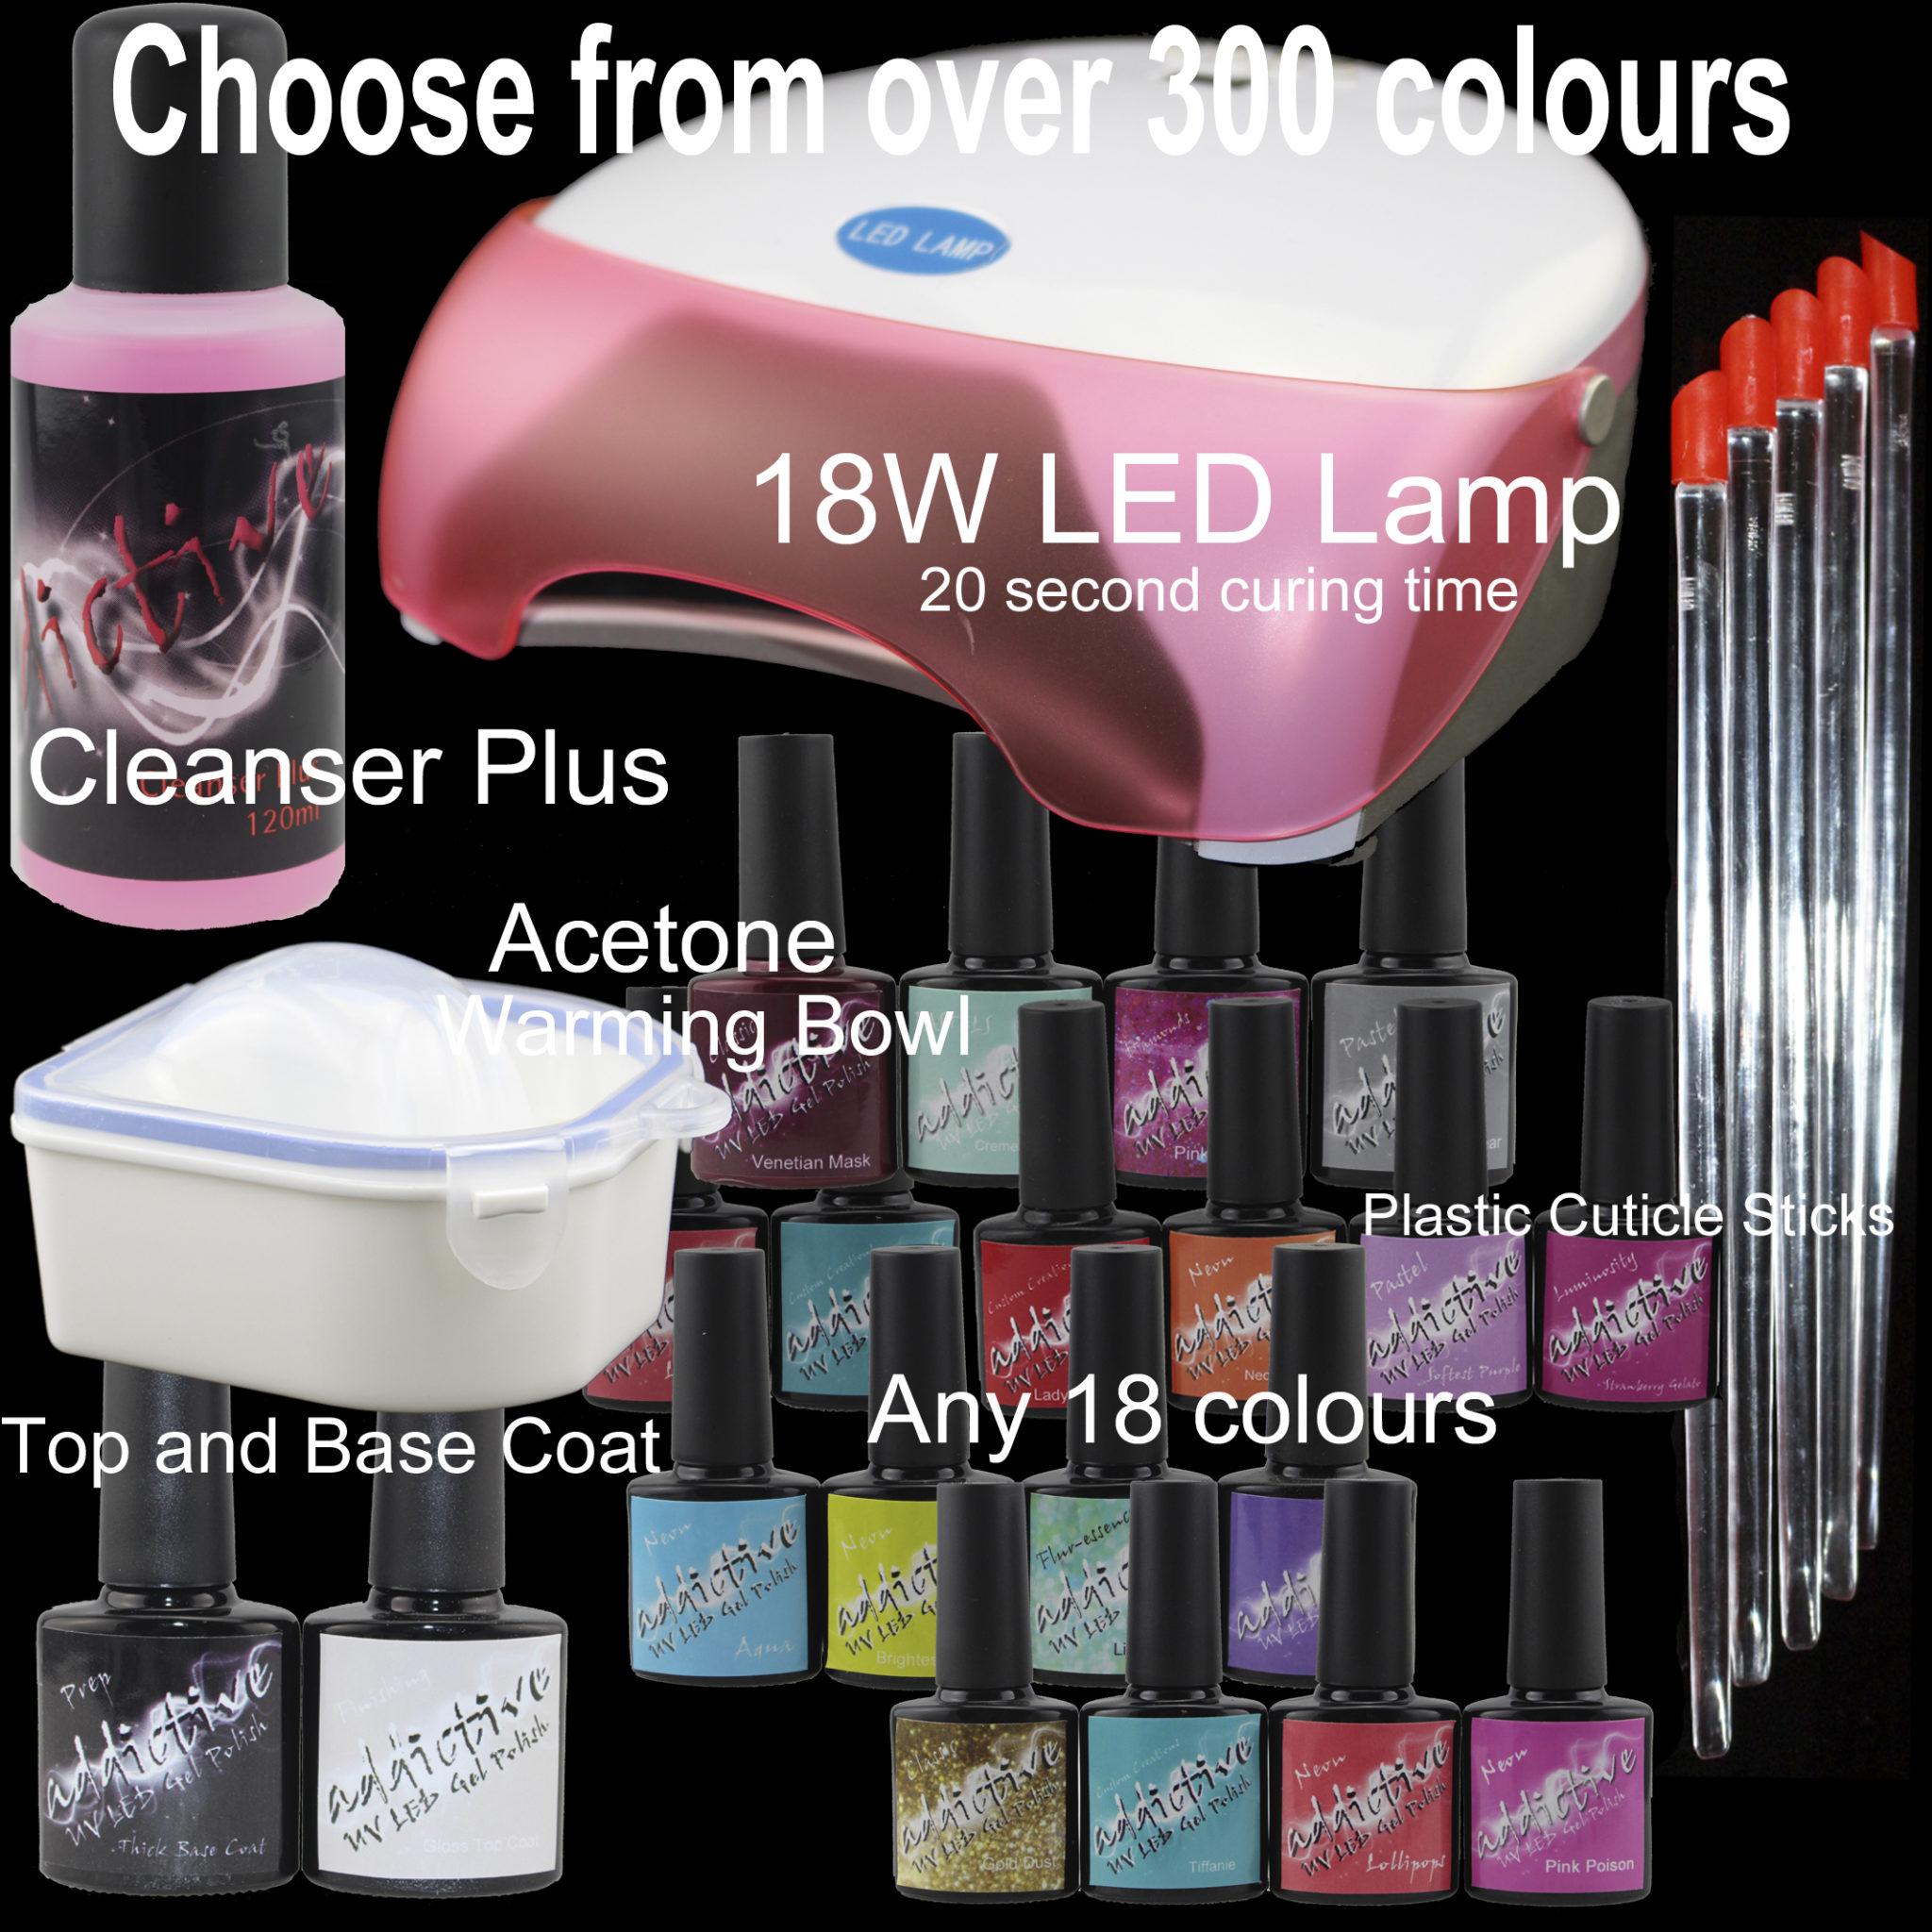 Addictive UV LED Gel Starter Kits and lamps